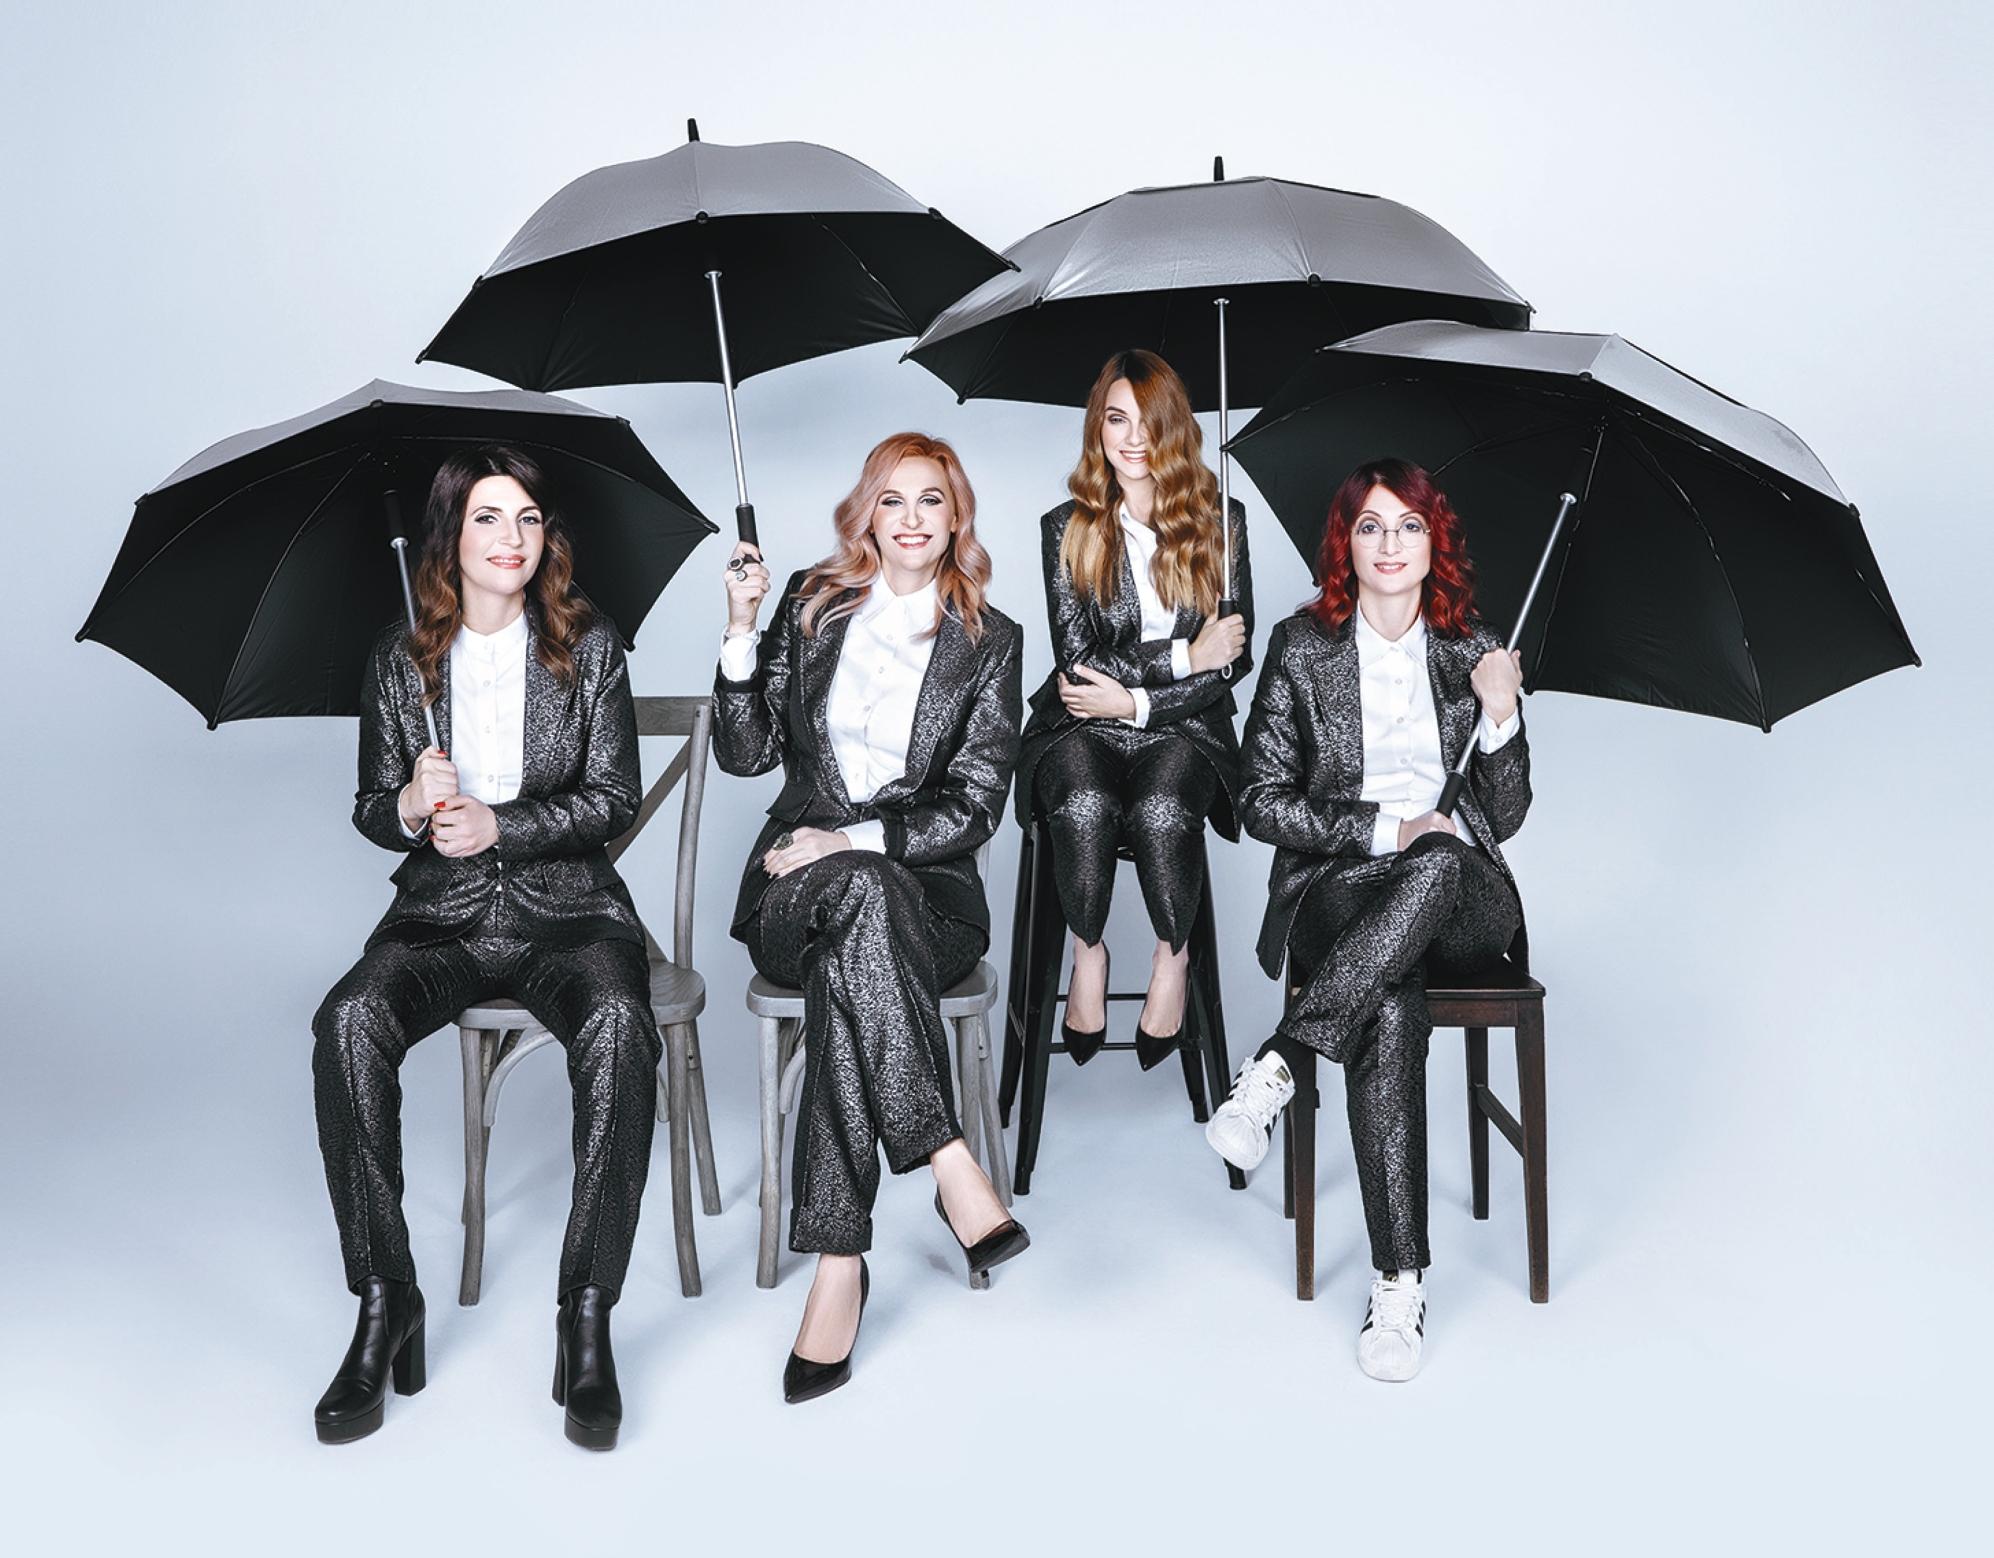 The Frajle su predstavile novi album 'Obraduj me'.